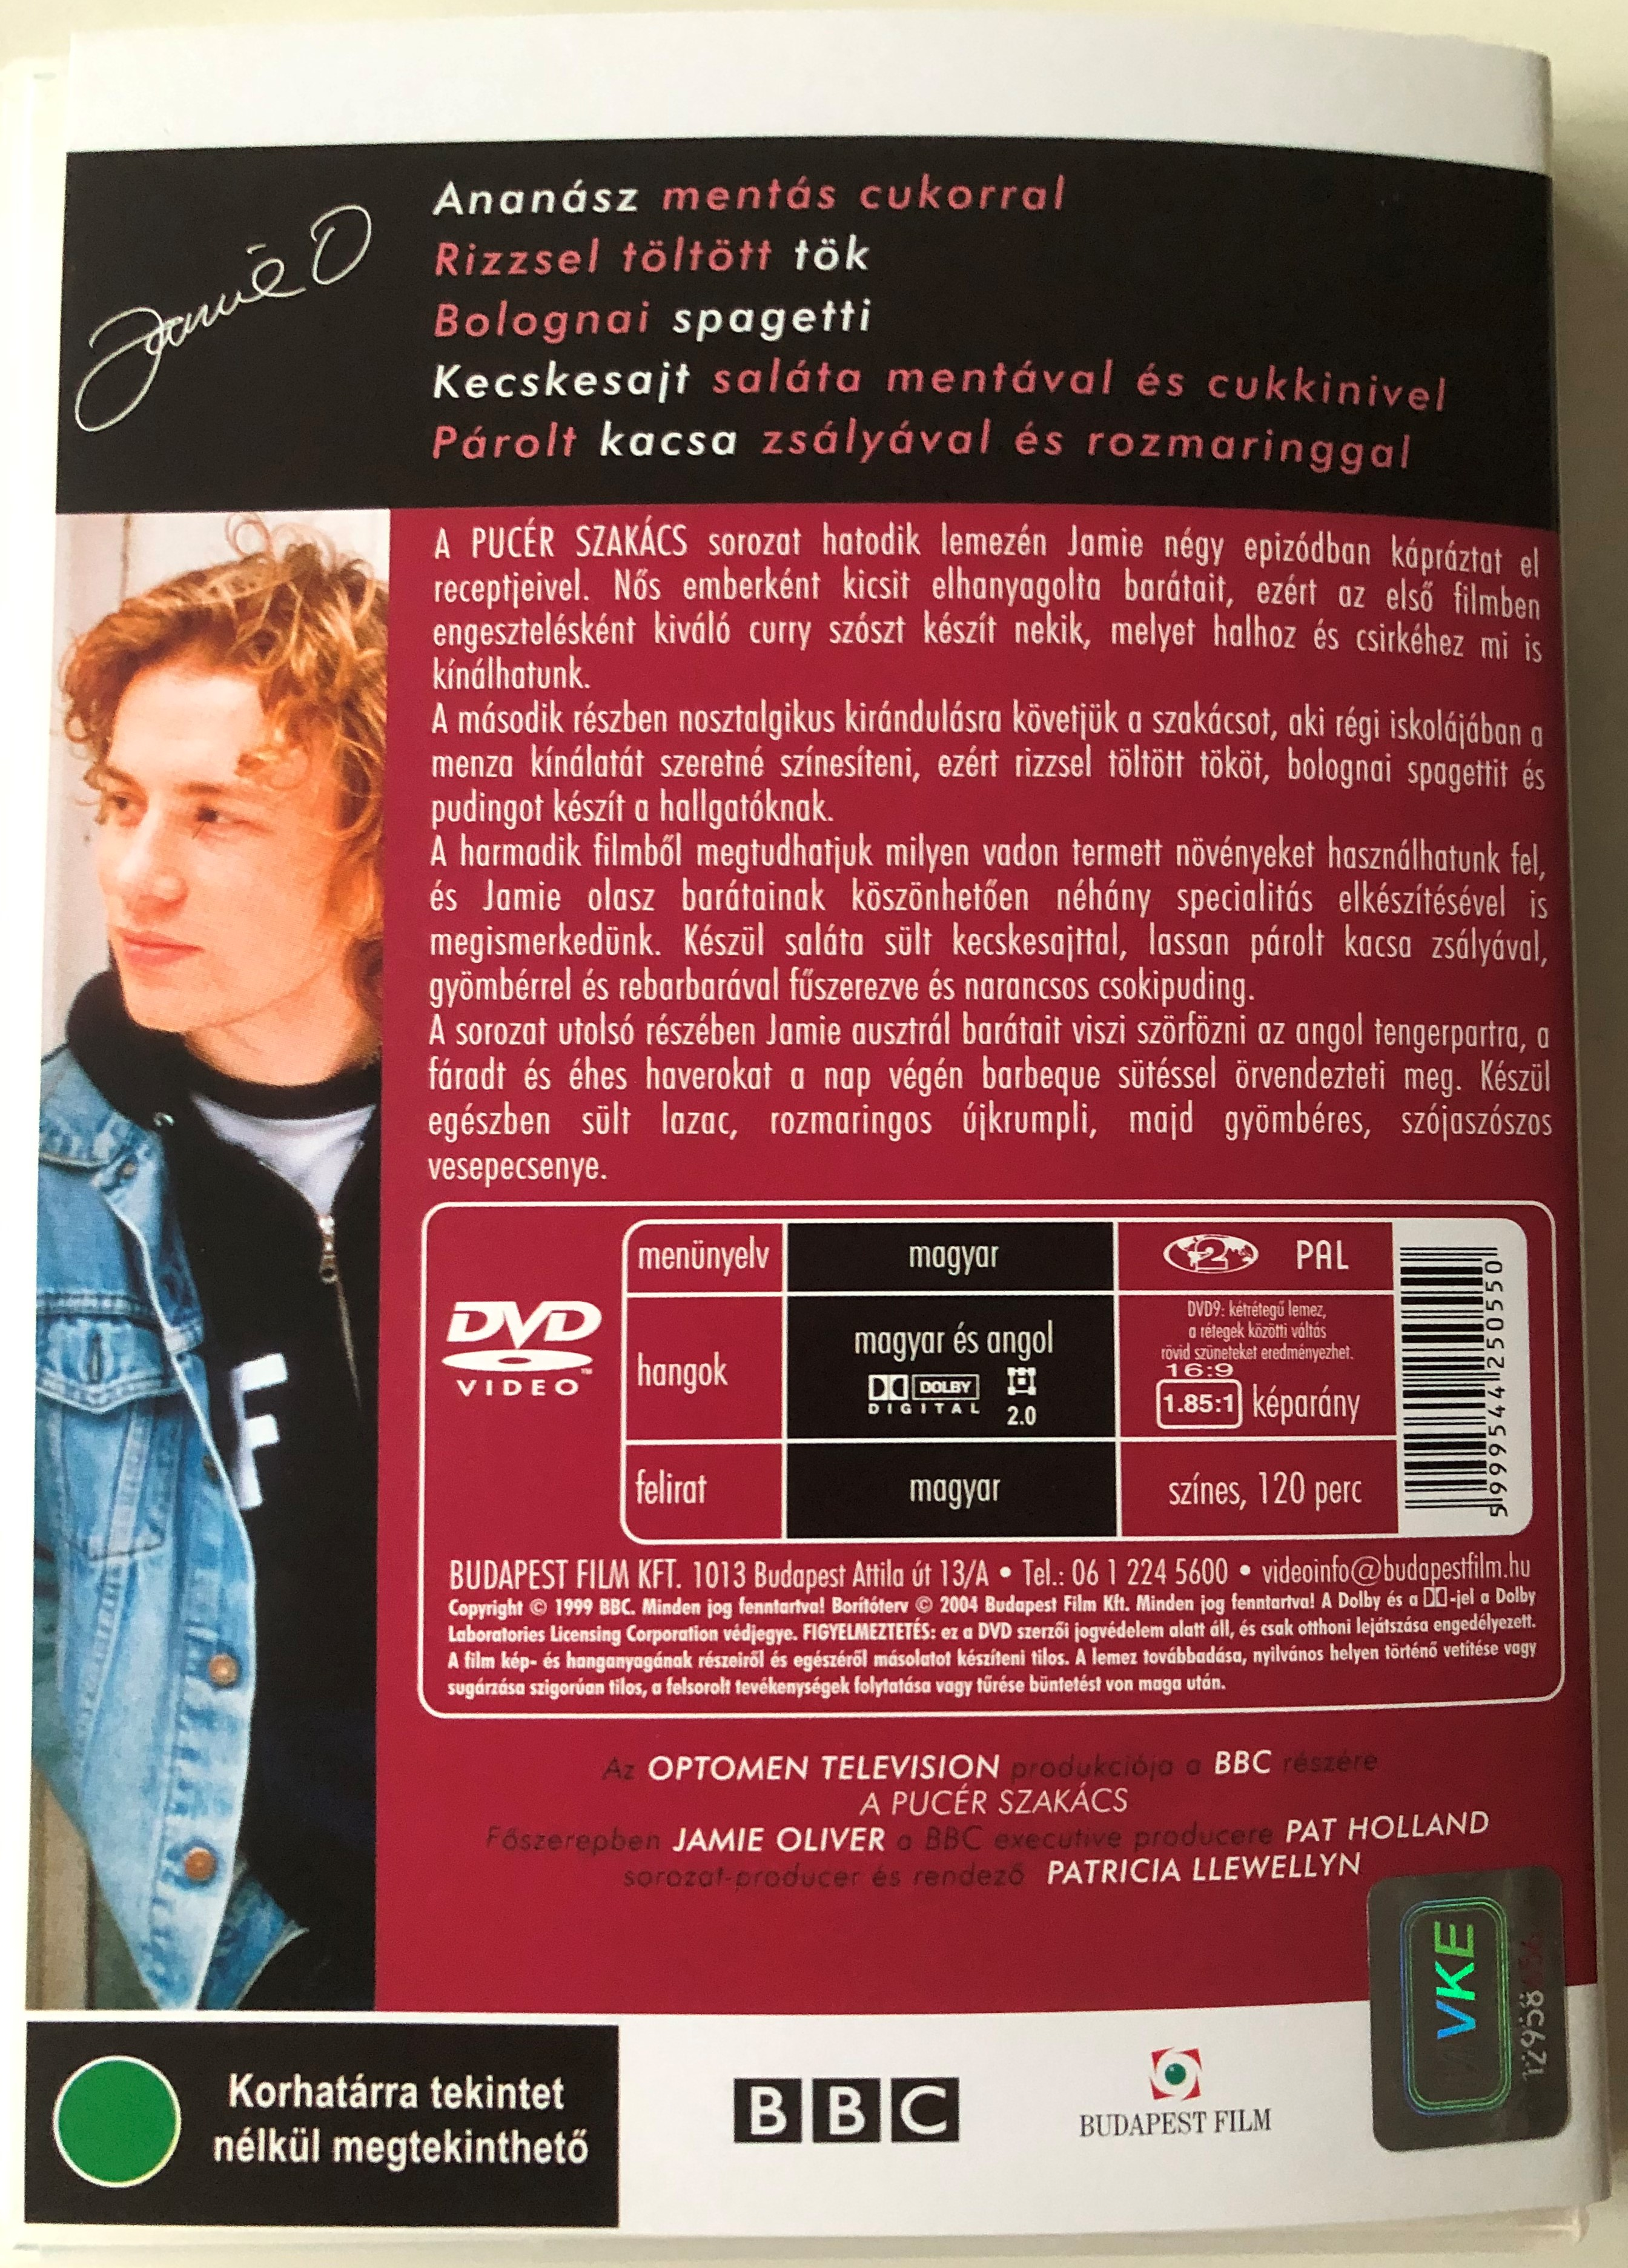 the-naked-chef-dvd-1999-a-puc-r-szak-cs-2.jpg